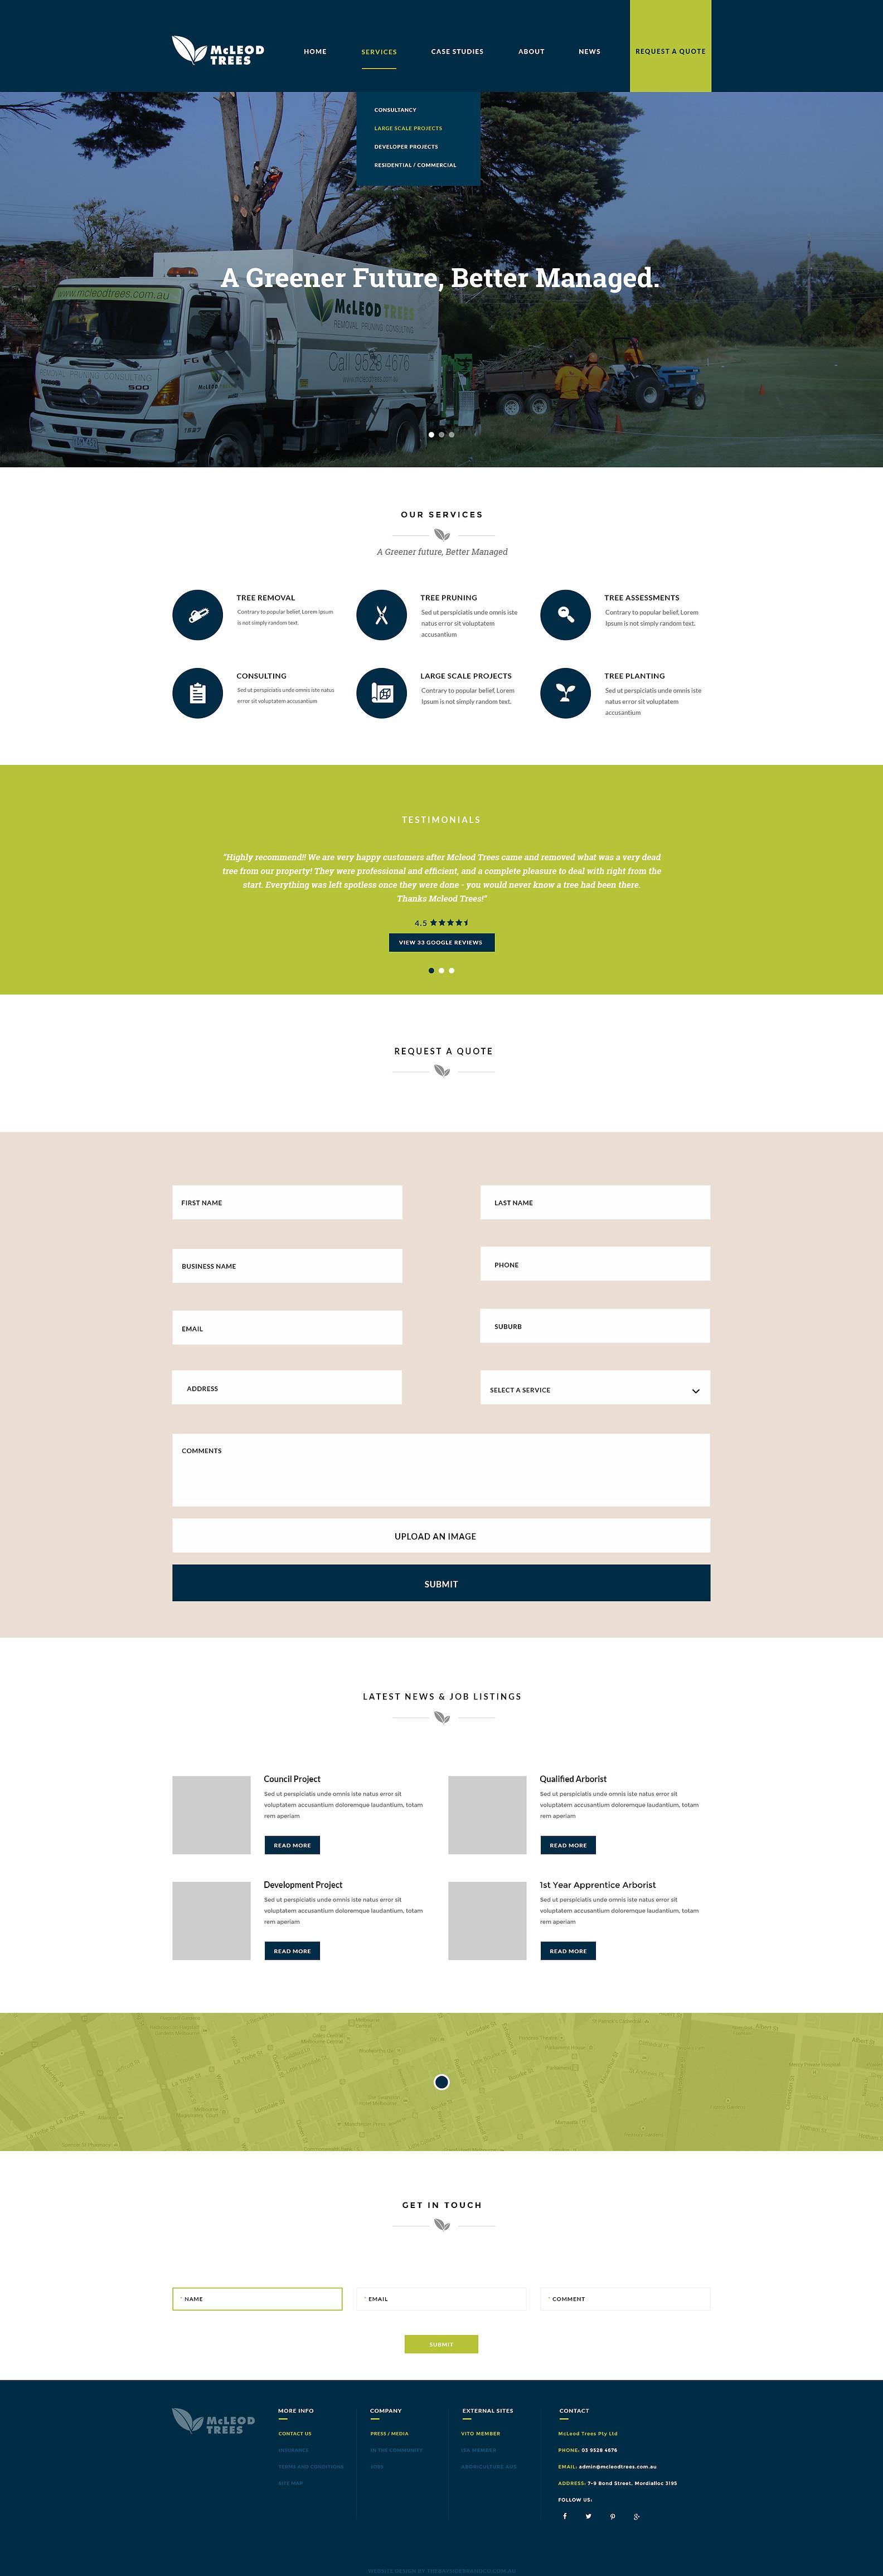 McLeod Trees_Website Mockup_Home Page_Pr